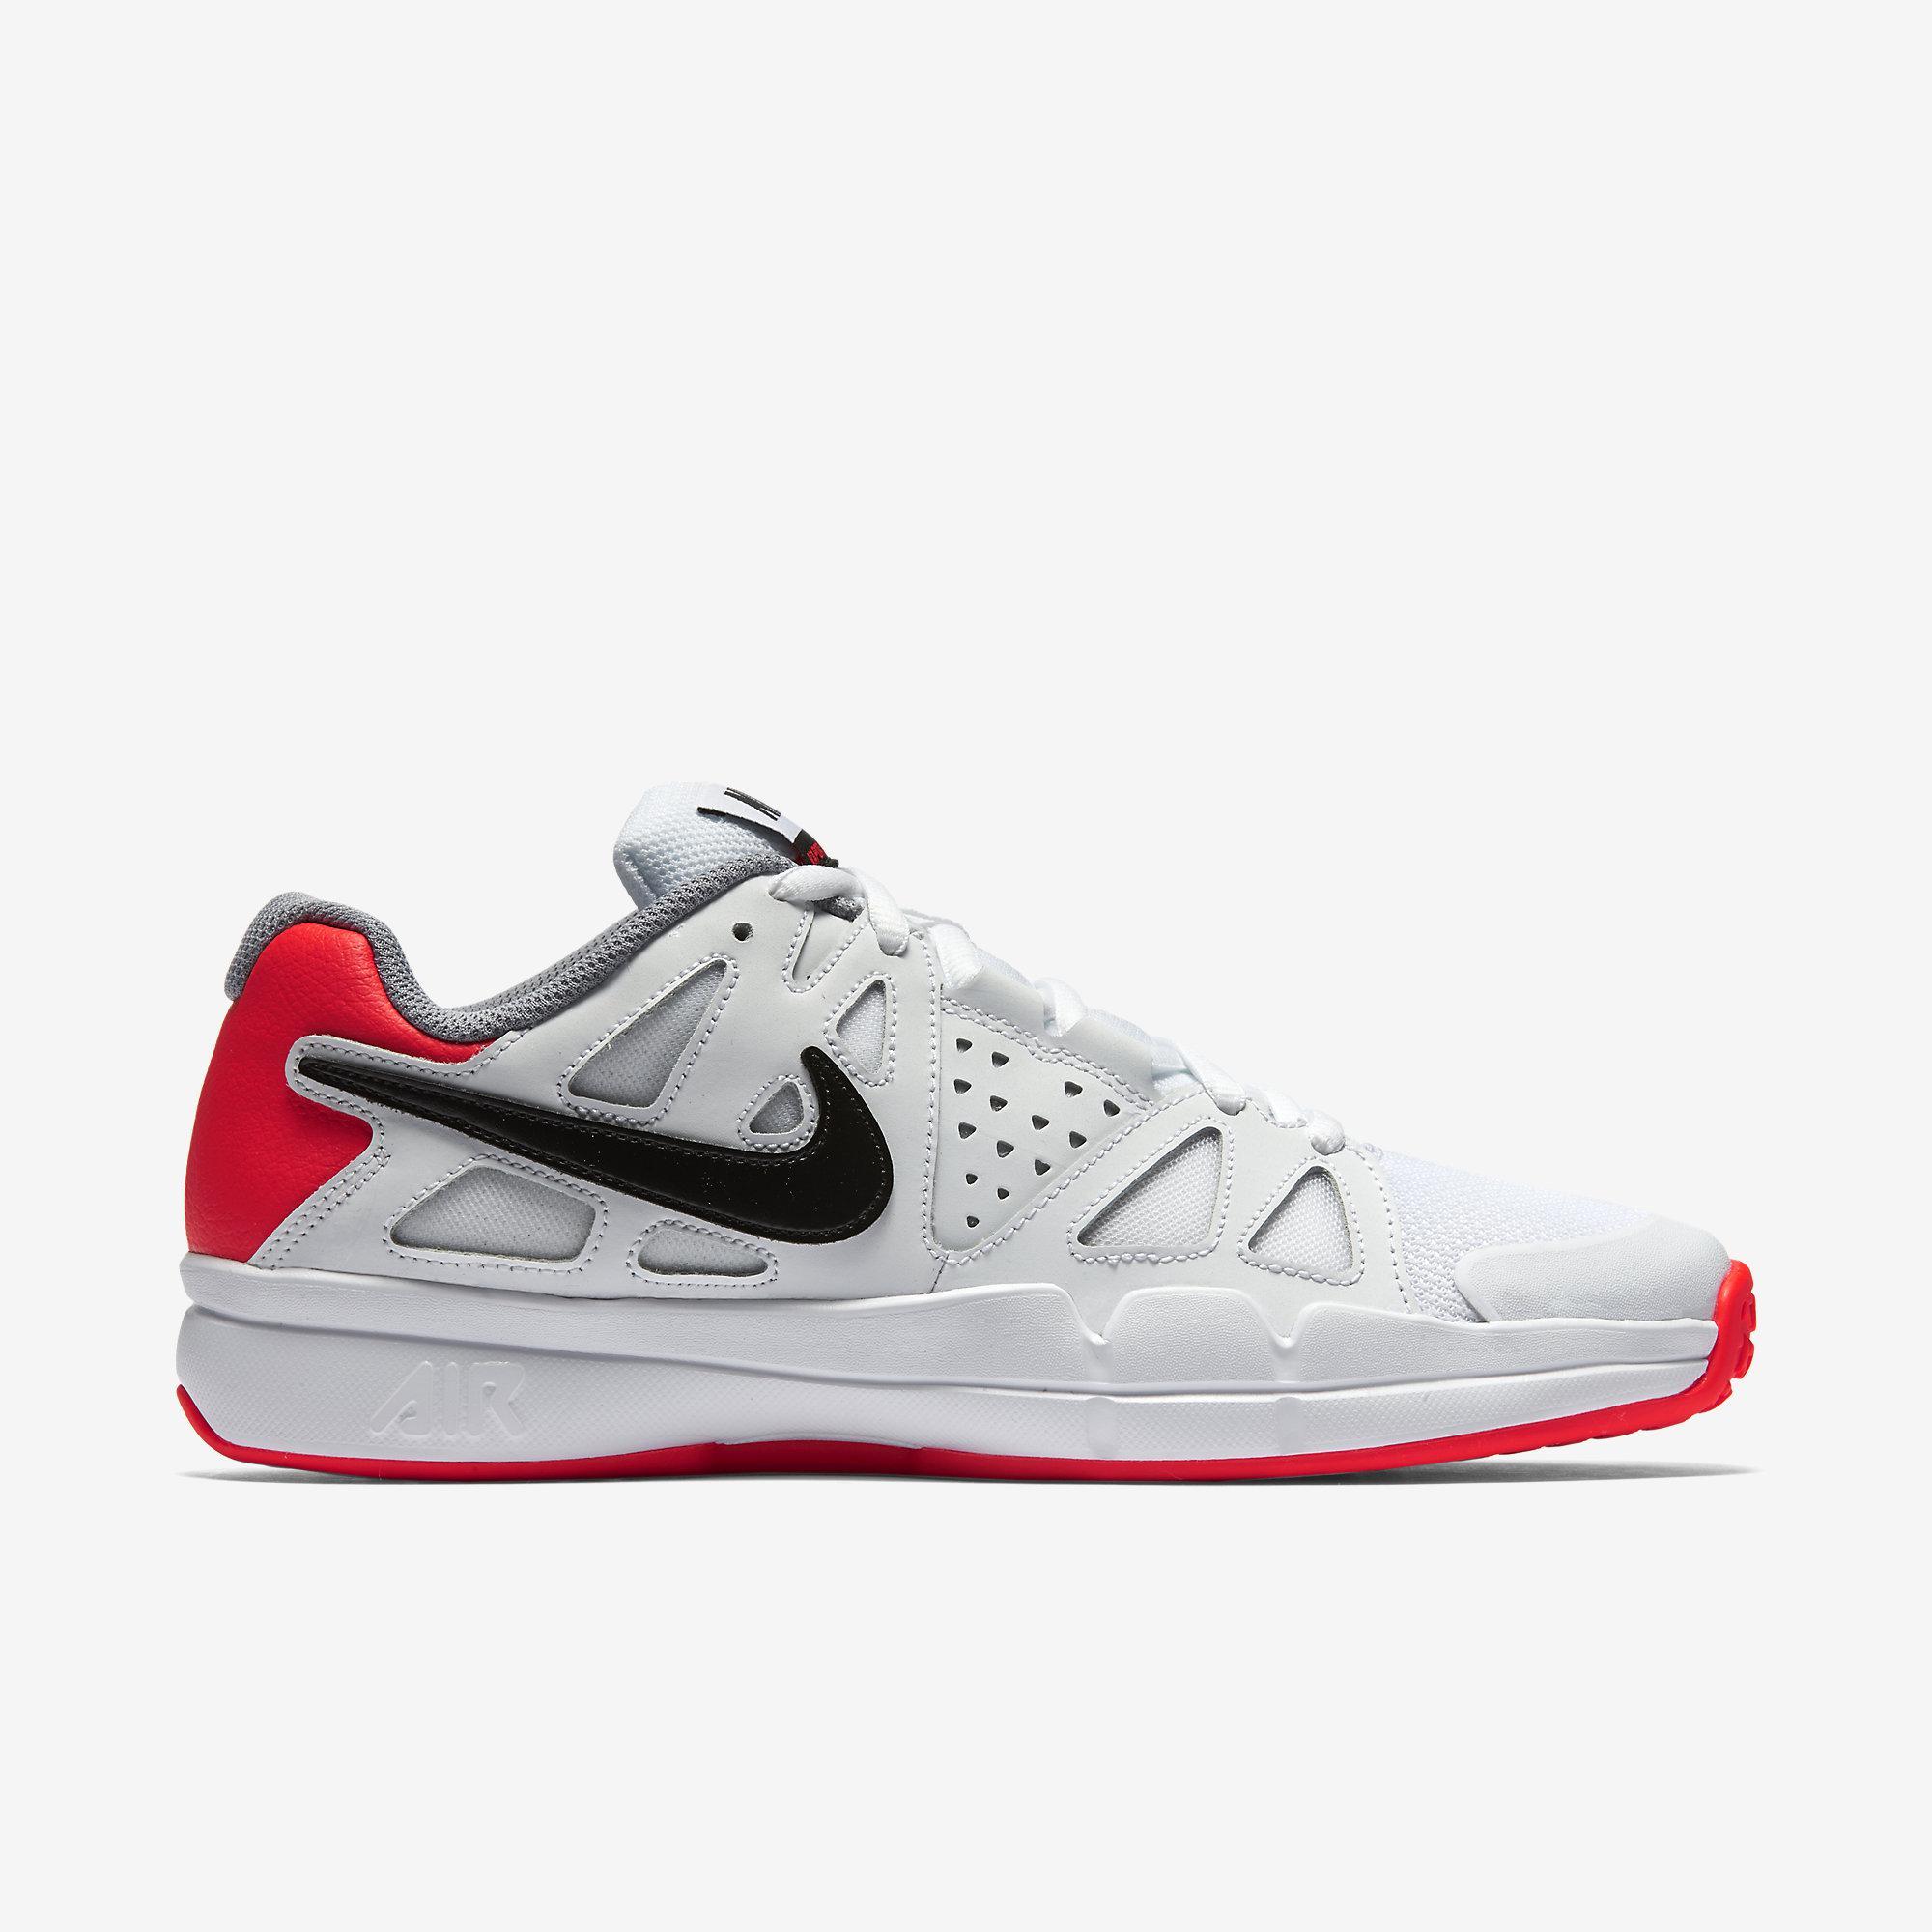 Nike Mens Air Vapor Advantage Omni Court Tennis Shoes WhiteCrimson